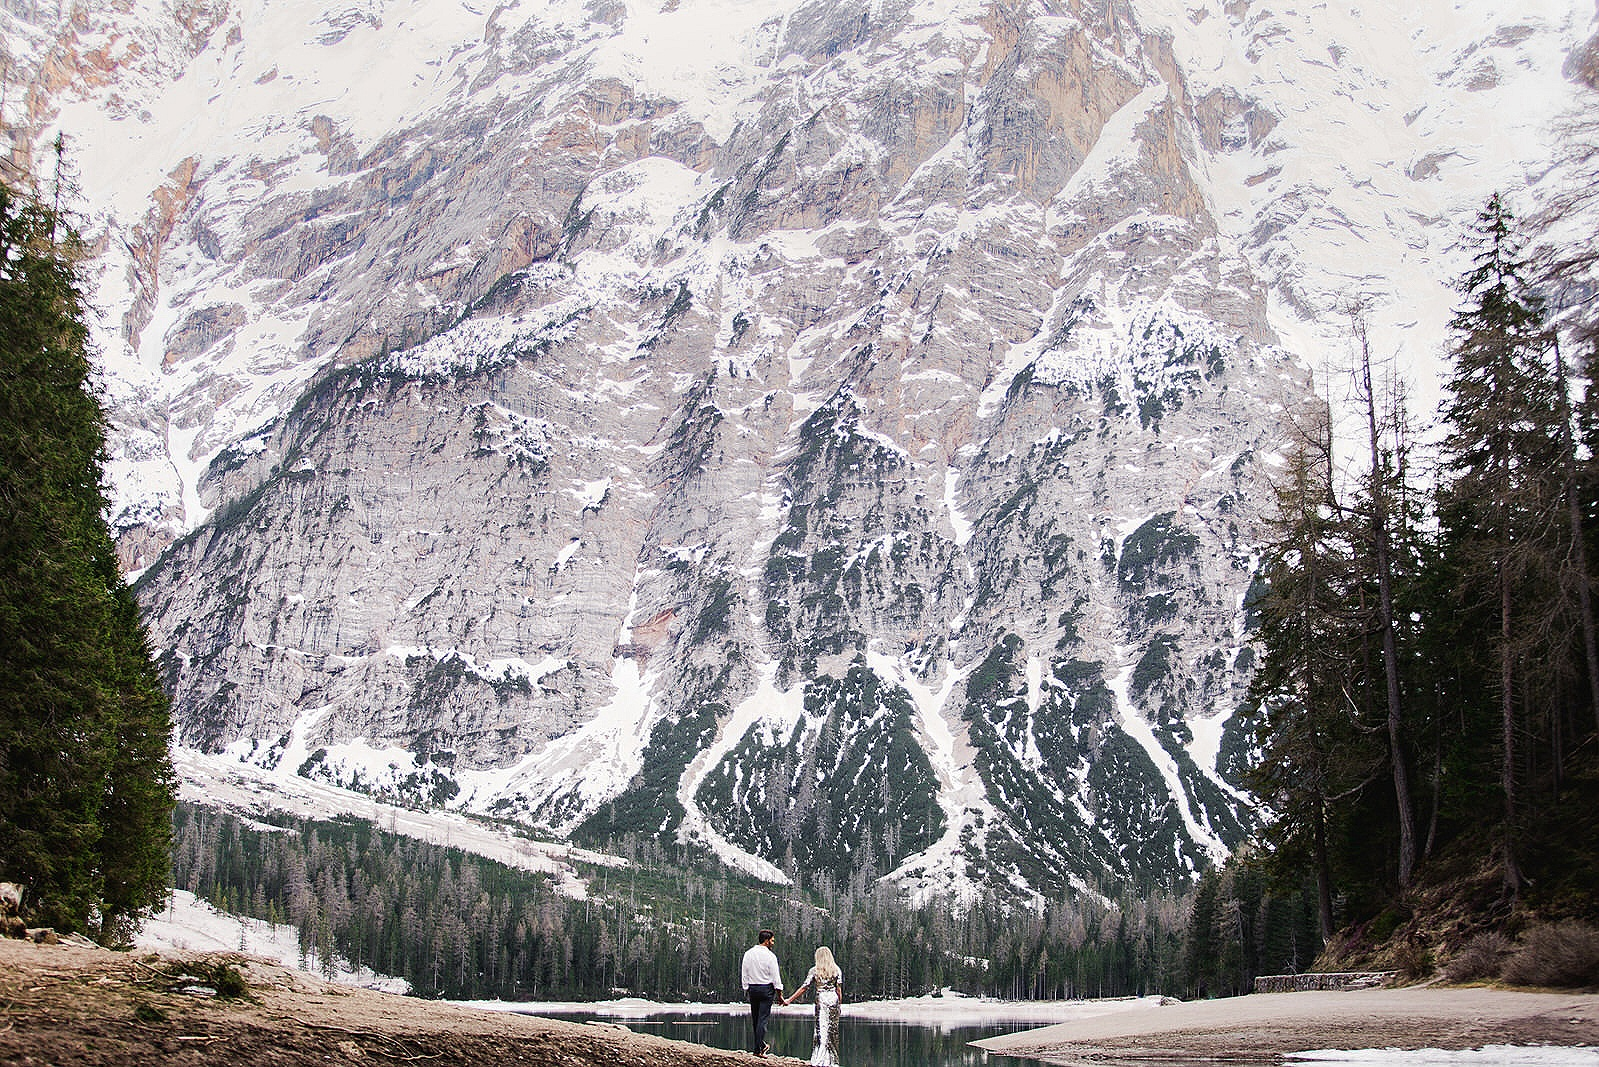 Fotomagoria+Dolomites+Lago+di+Braies+Photographer+34.jpg